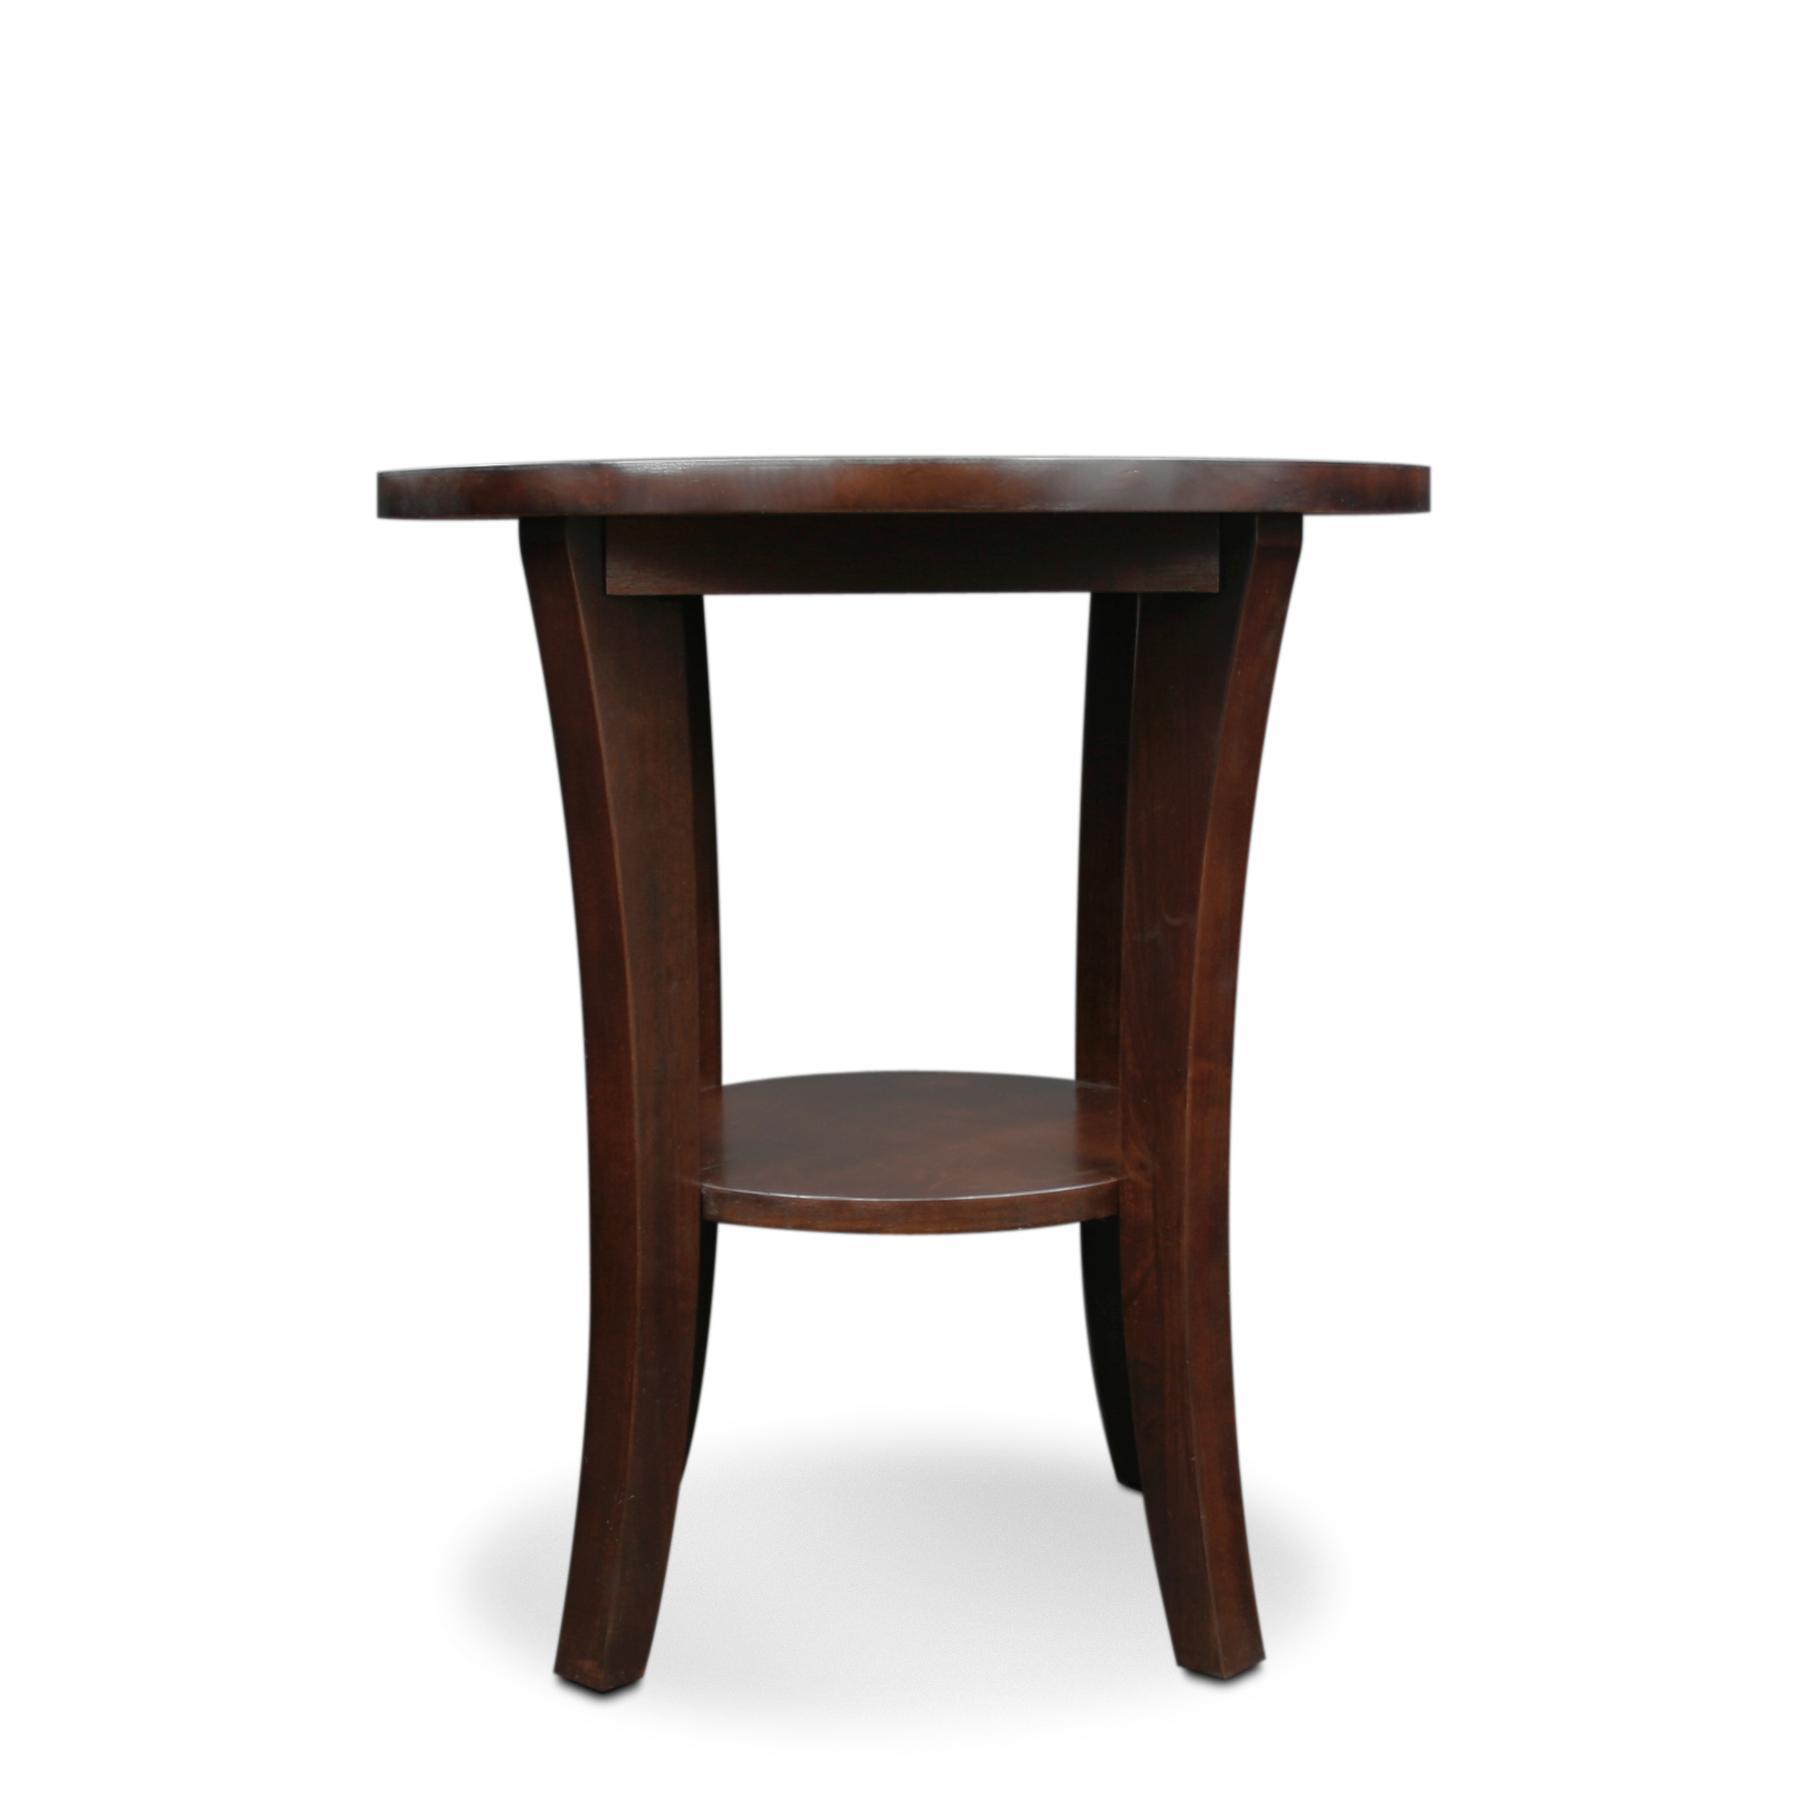 Amazoncom Leick Furniture Boa Collection Solid Wood  : 83ae87b5 51be 441a 842c efa21203d8efjpgCB318891786 from www.amazon.com size 1800 x 1800 jpeg 84kB